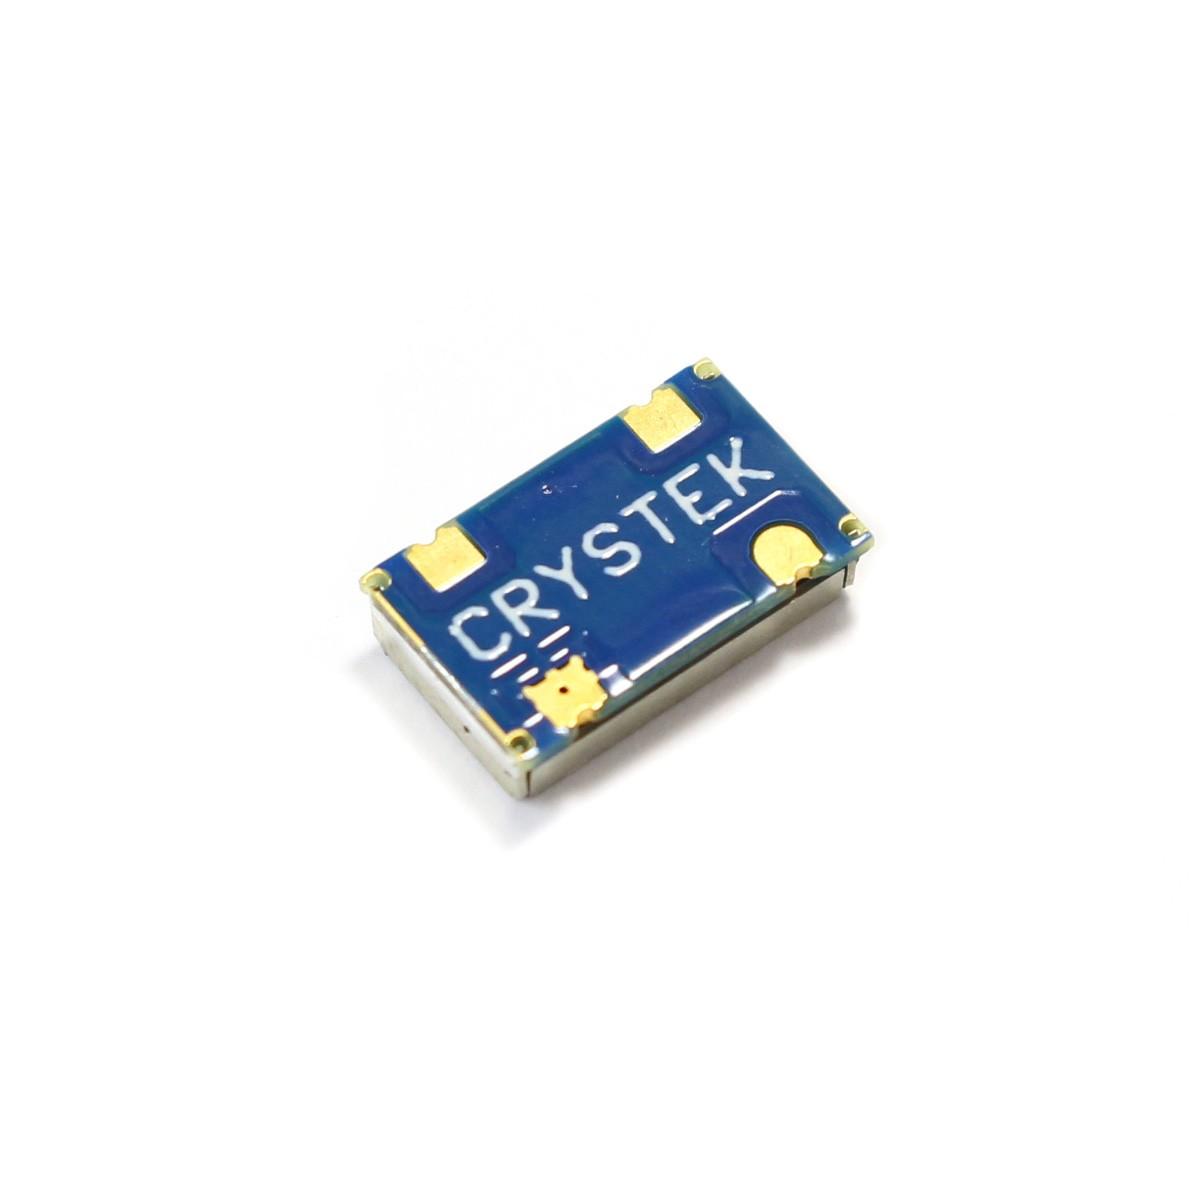 CRYSTEK Horloge à Bruit de Phase Ultra Faible 24.576MHz 3.3V 25ppm HCMOS